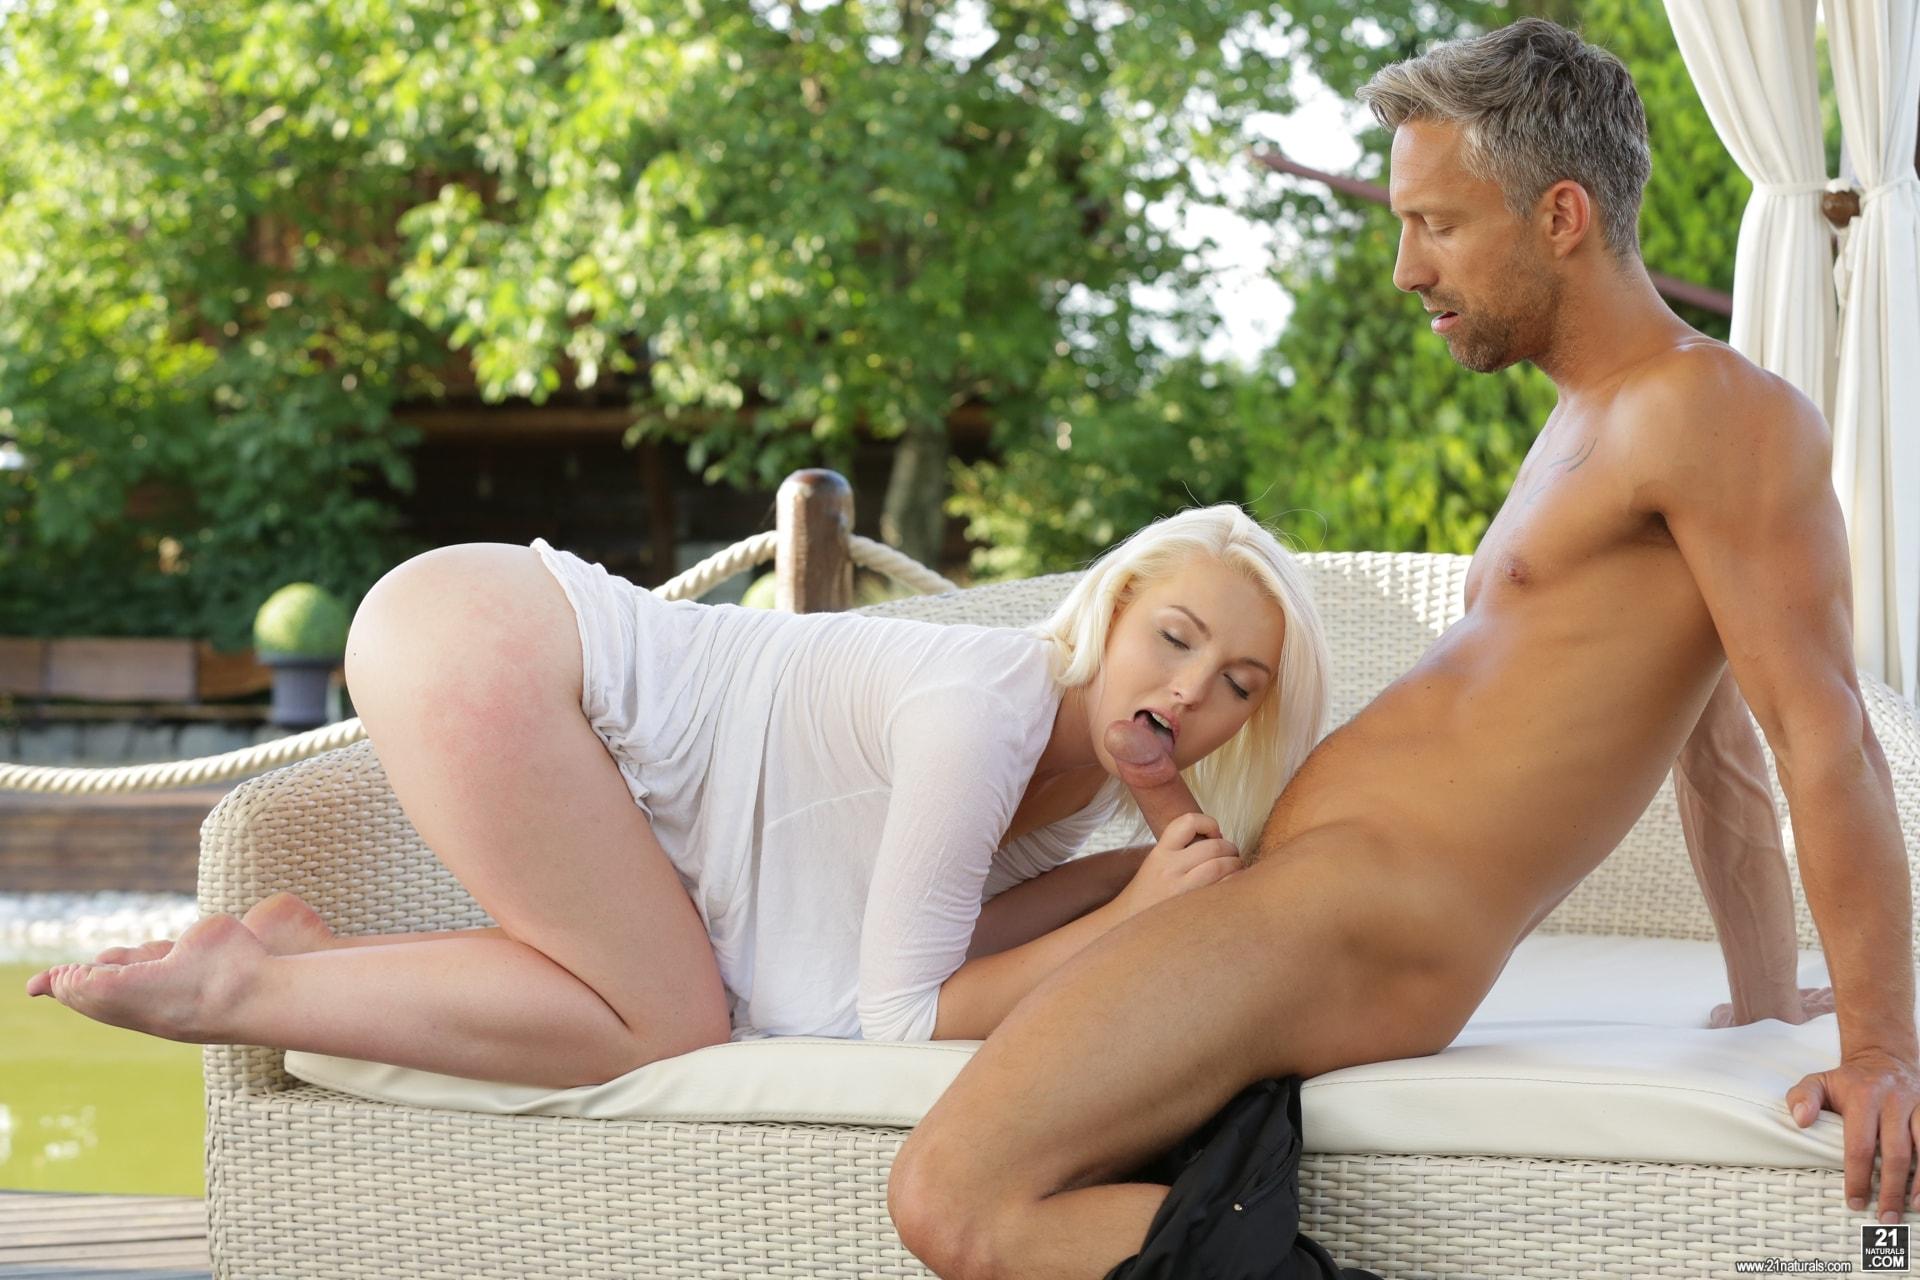 Blonde babe lovisa fate takes a load of hot jizz in her face 9